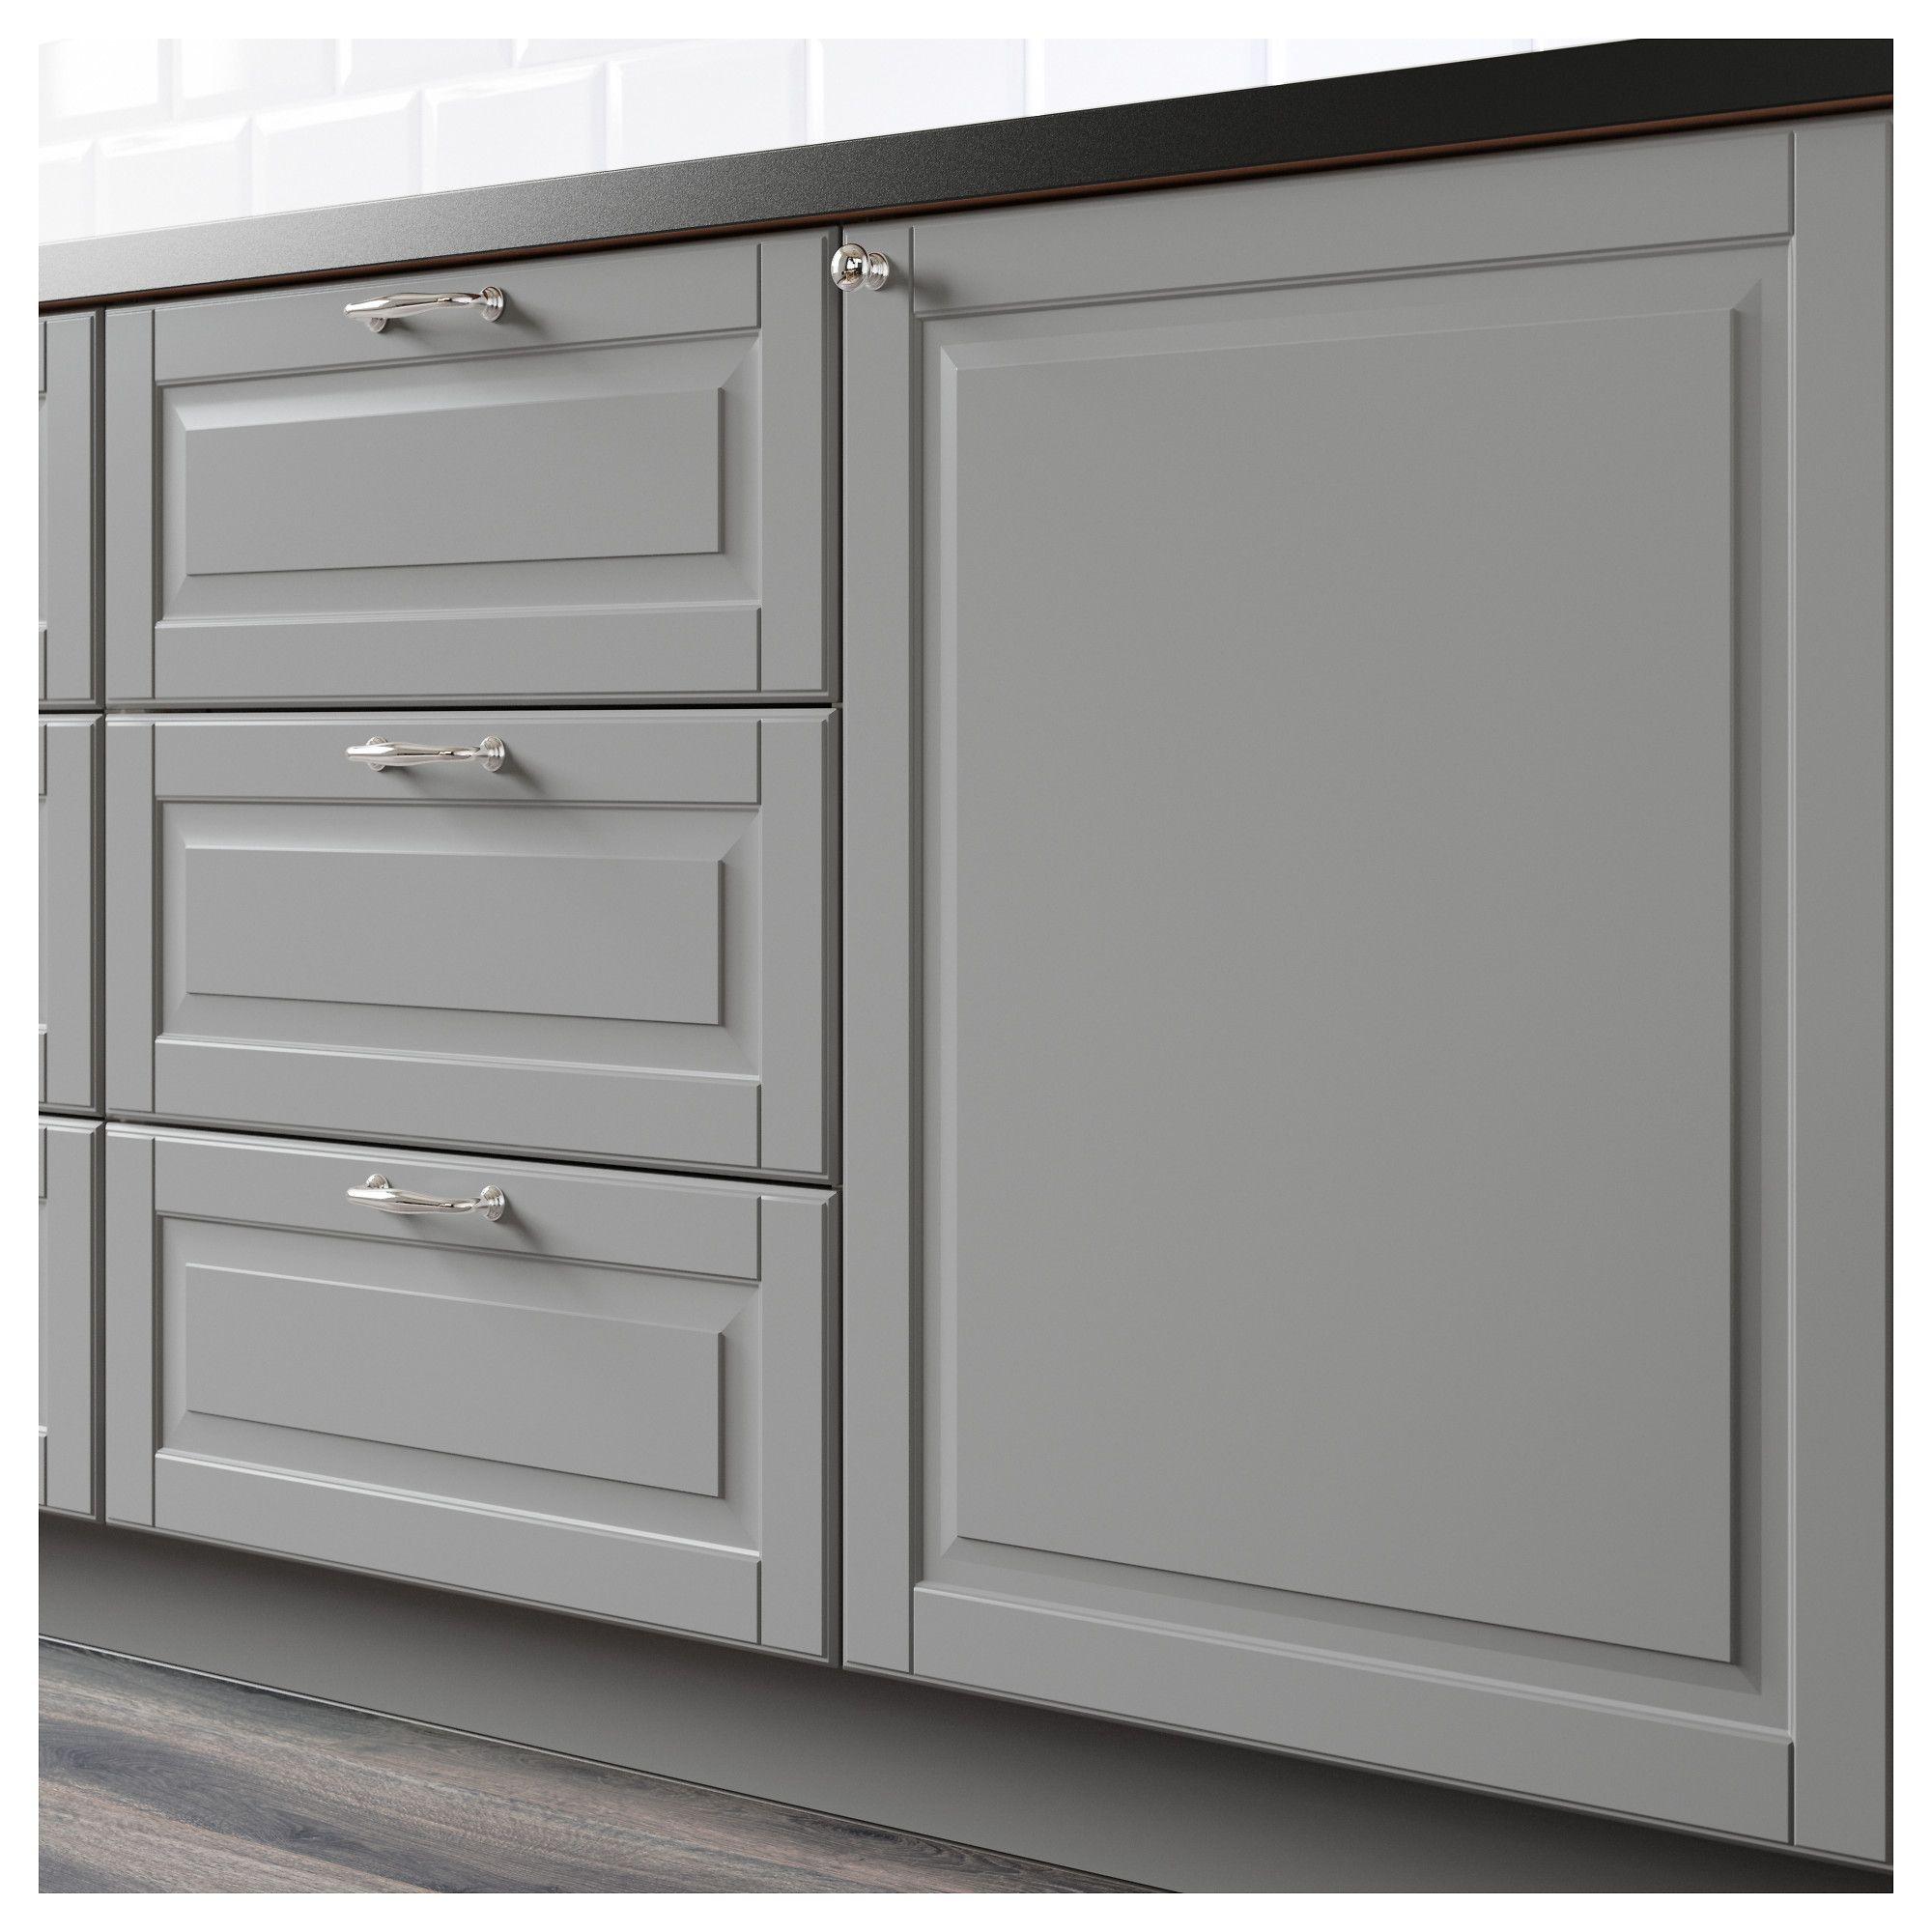 Ikea Bodbyn Drawer Front Gray Bodbyn Corner Base Cabinet Base Cabinets